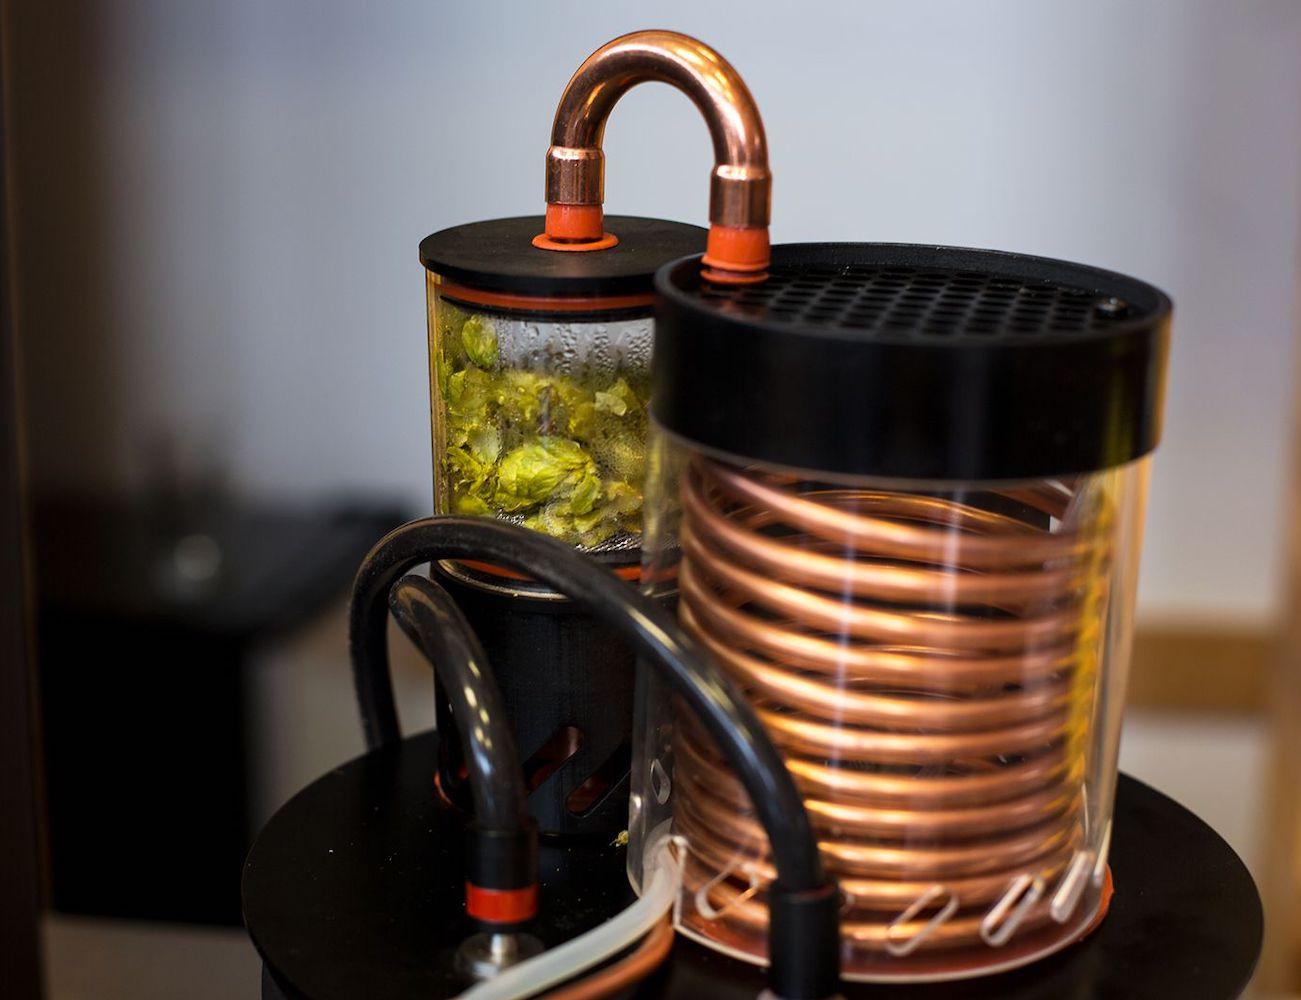 PicoStill Distilling Attachment makes home brewing even safer